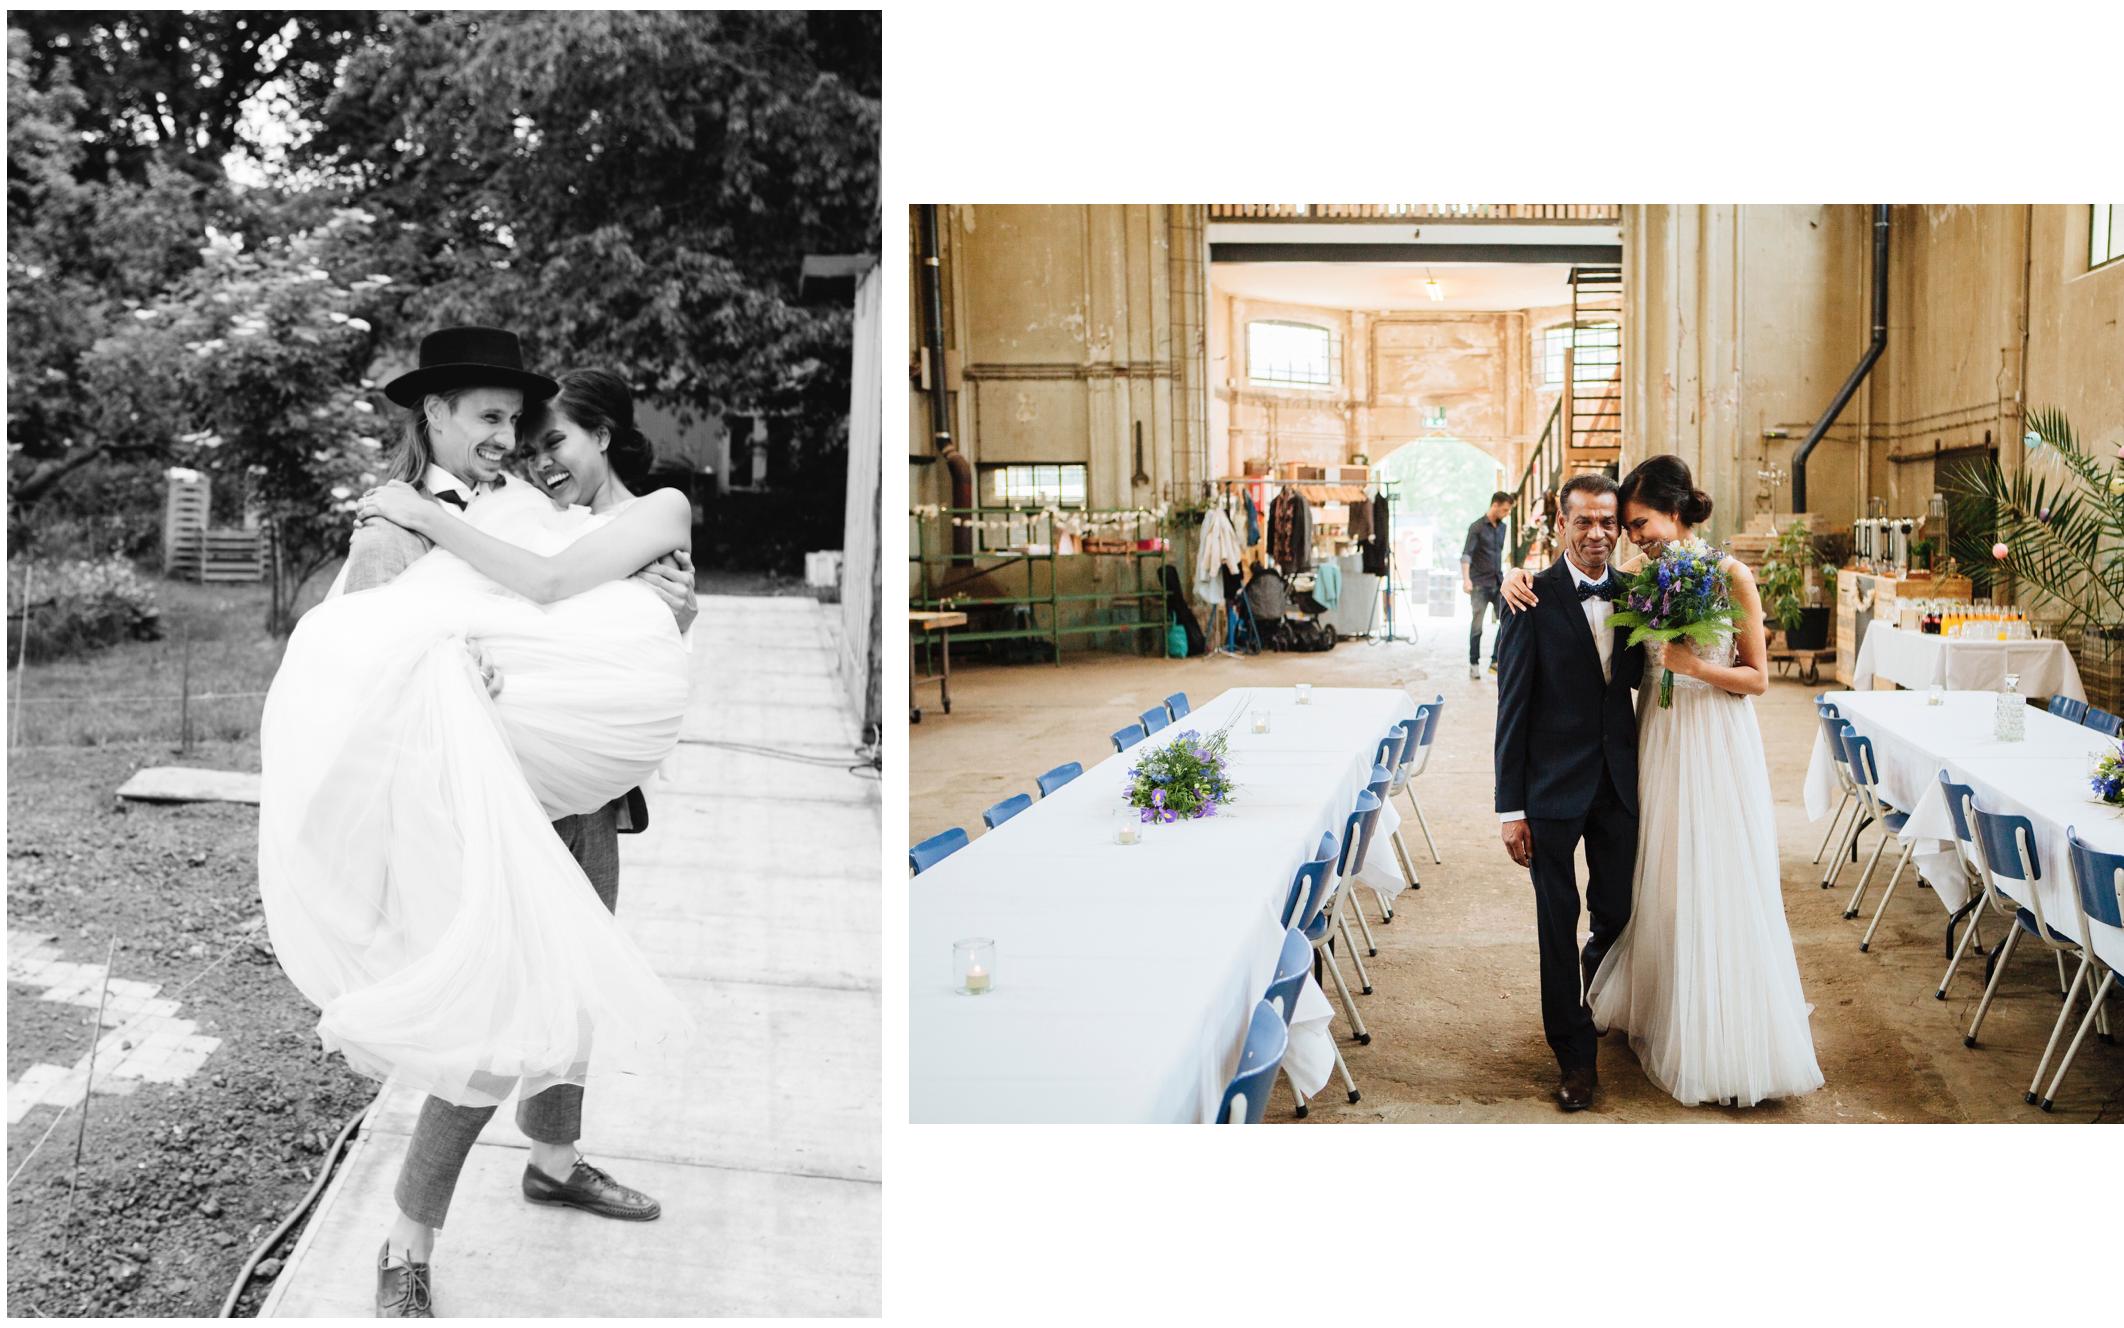 twee keer trouwen